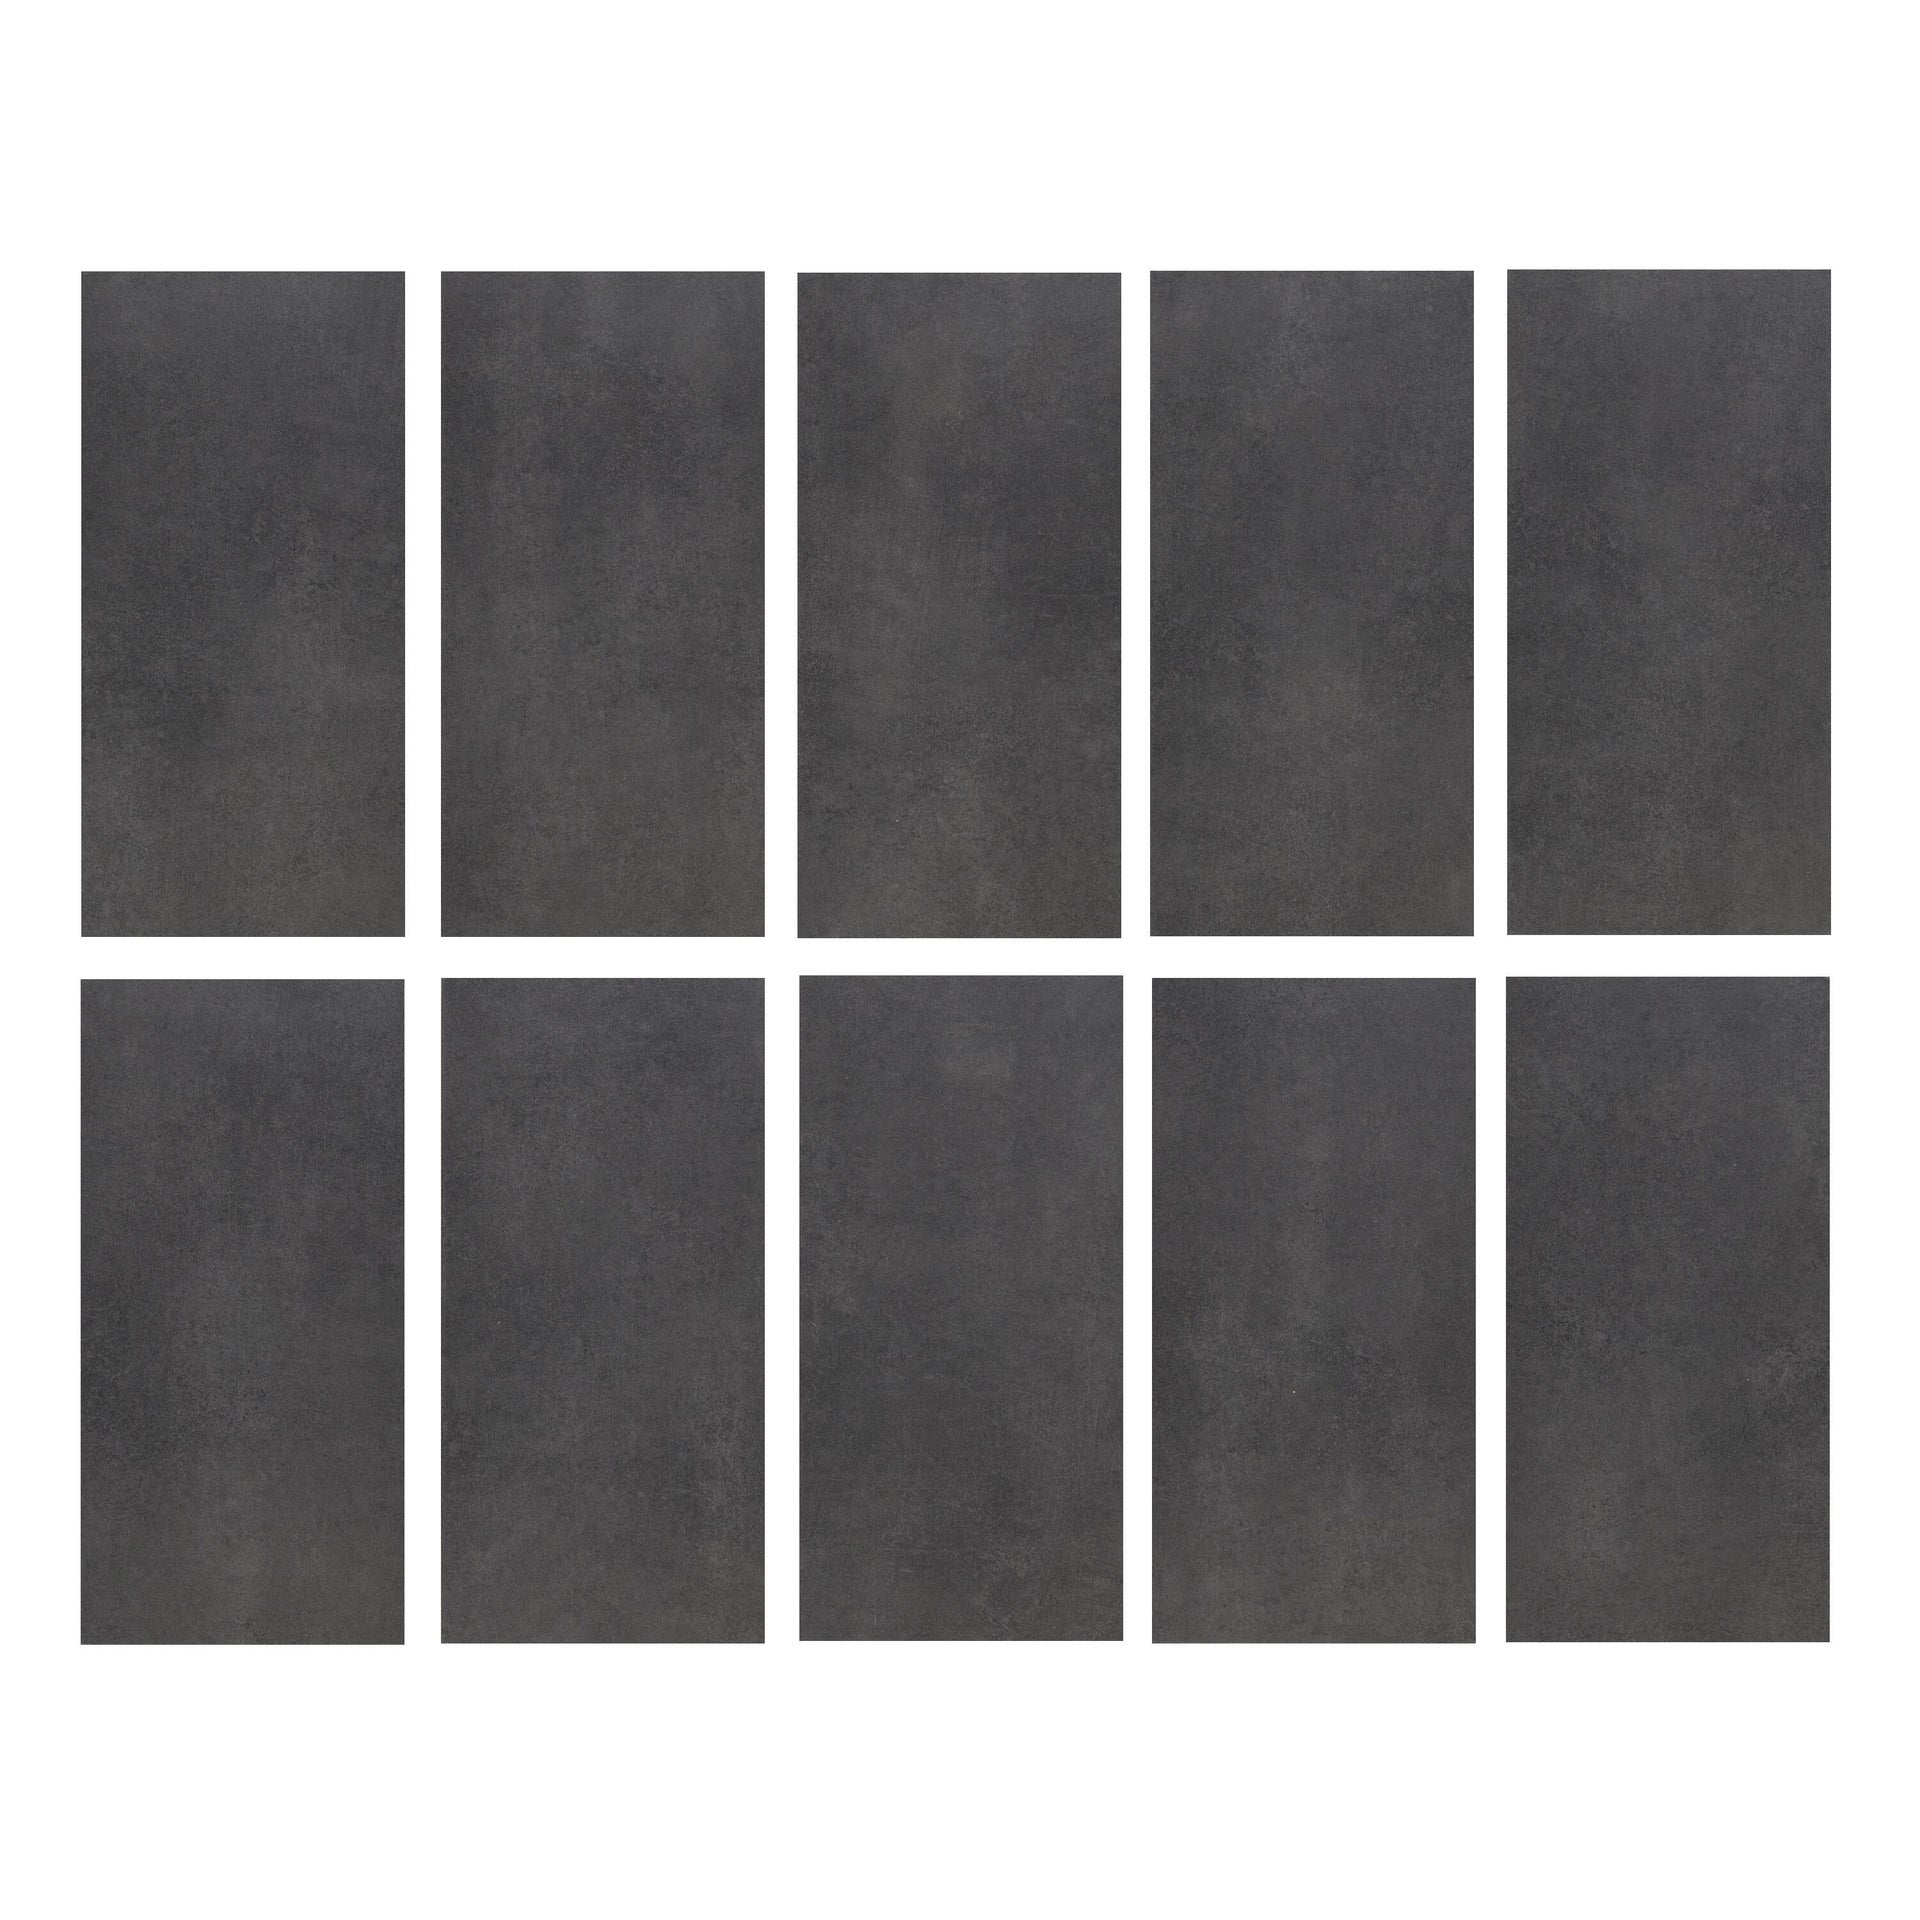 Pavimento PVC flottante clic+ Art For New Sp 4.2 mm nero - 7